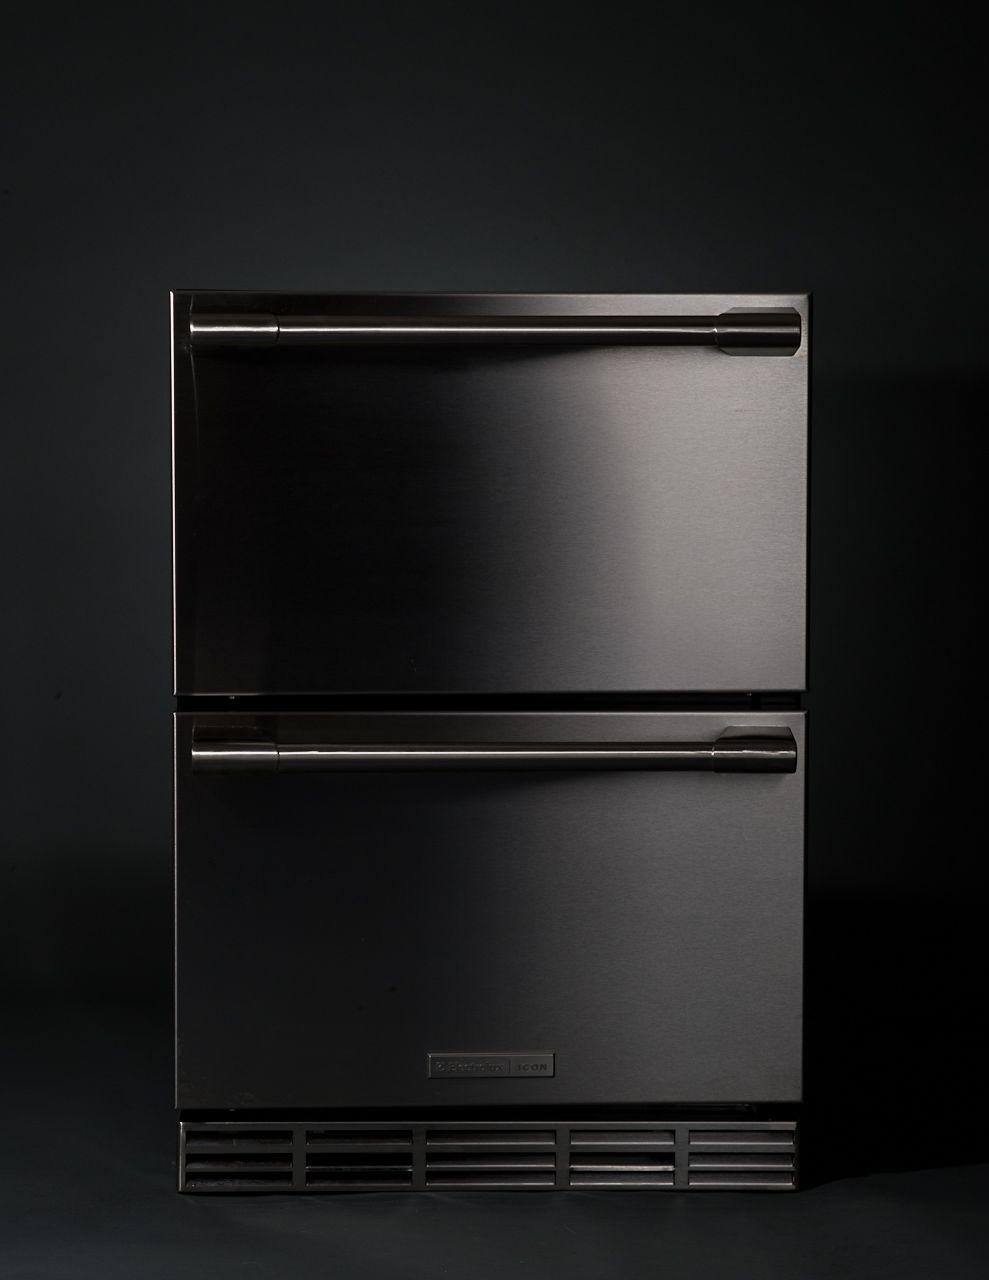 Electrolux Icon Under Counter Refrigerator Drawers 1 Refrigerator Drawers Outdoor Kitchen Appliances Outdoor Kitchen Design